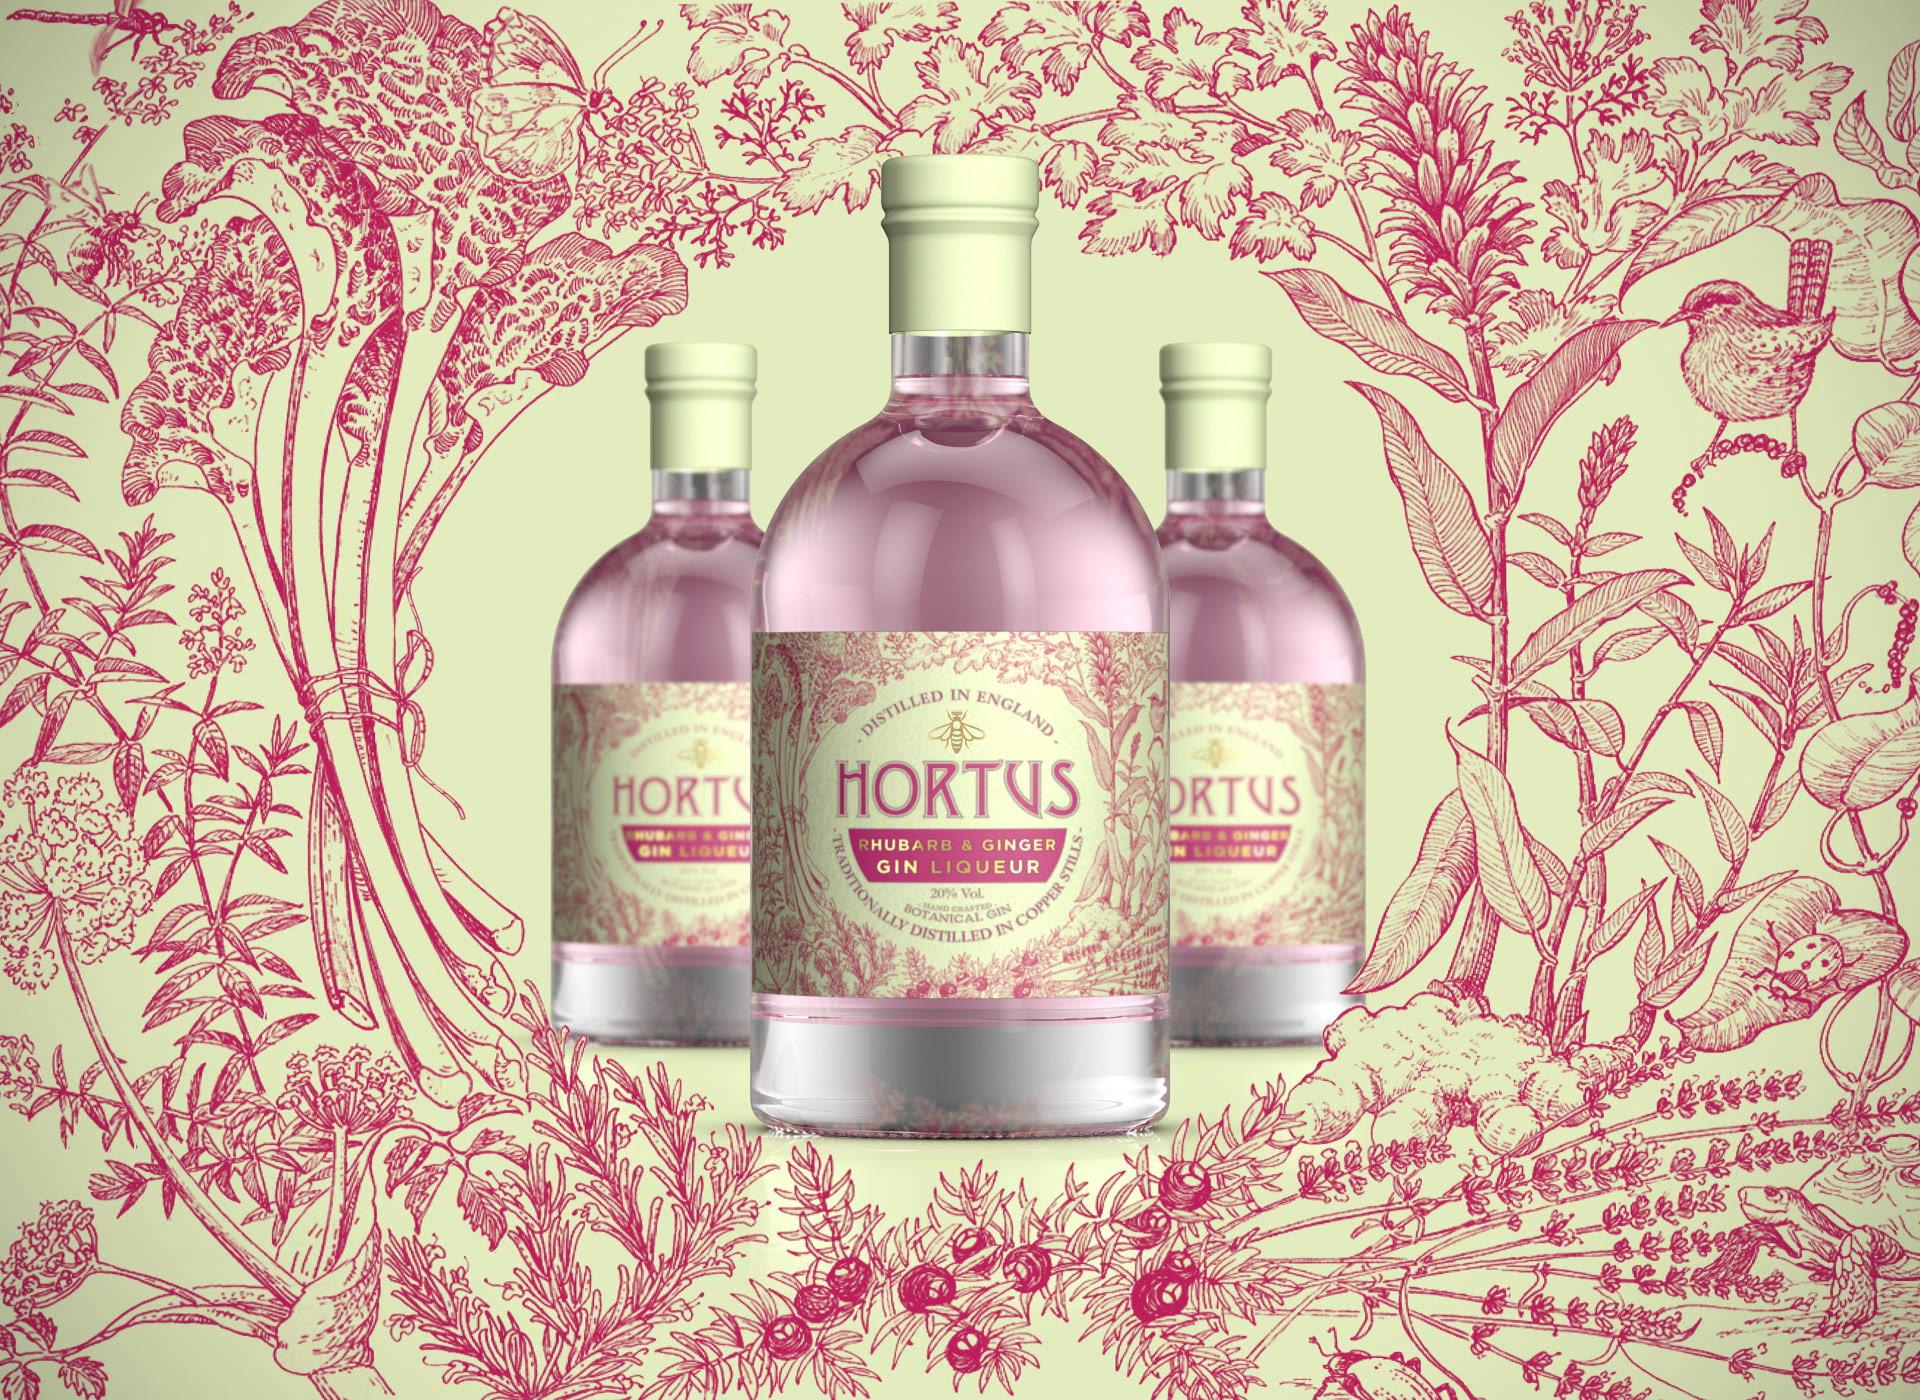 Hortus Gin © Holey and Moley Ltd